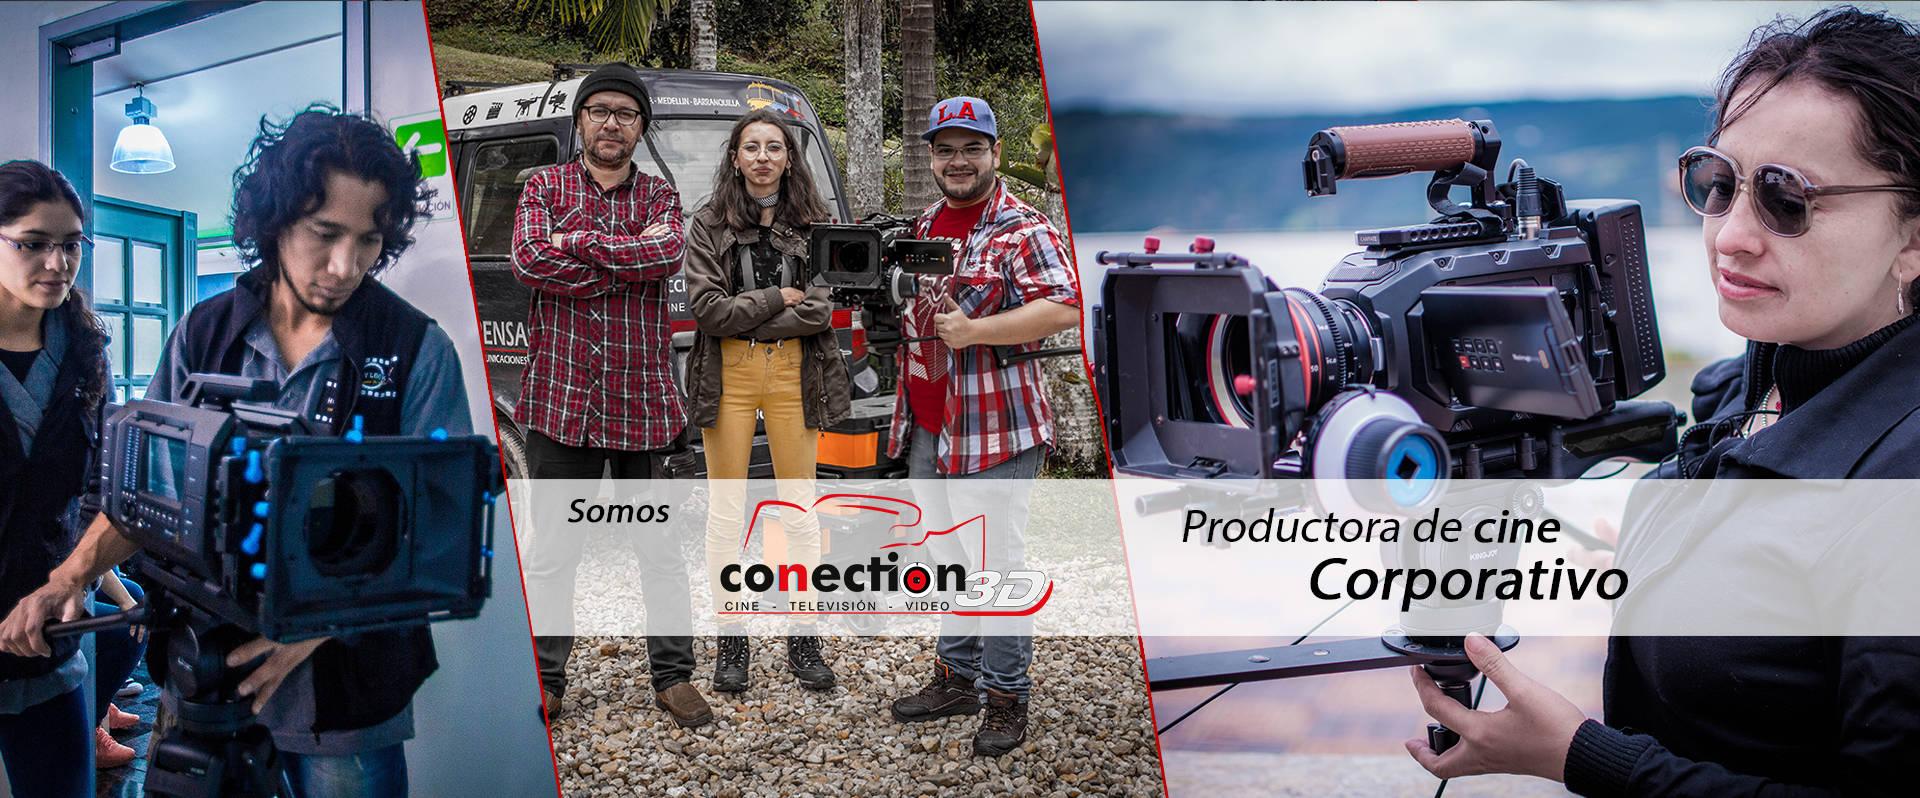 Conection-3D-productora-de-cine-corporat